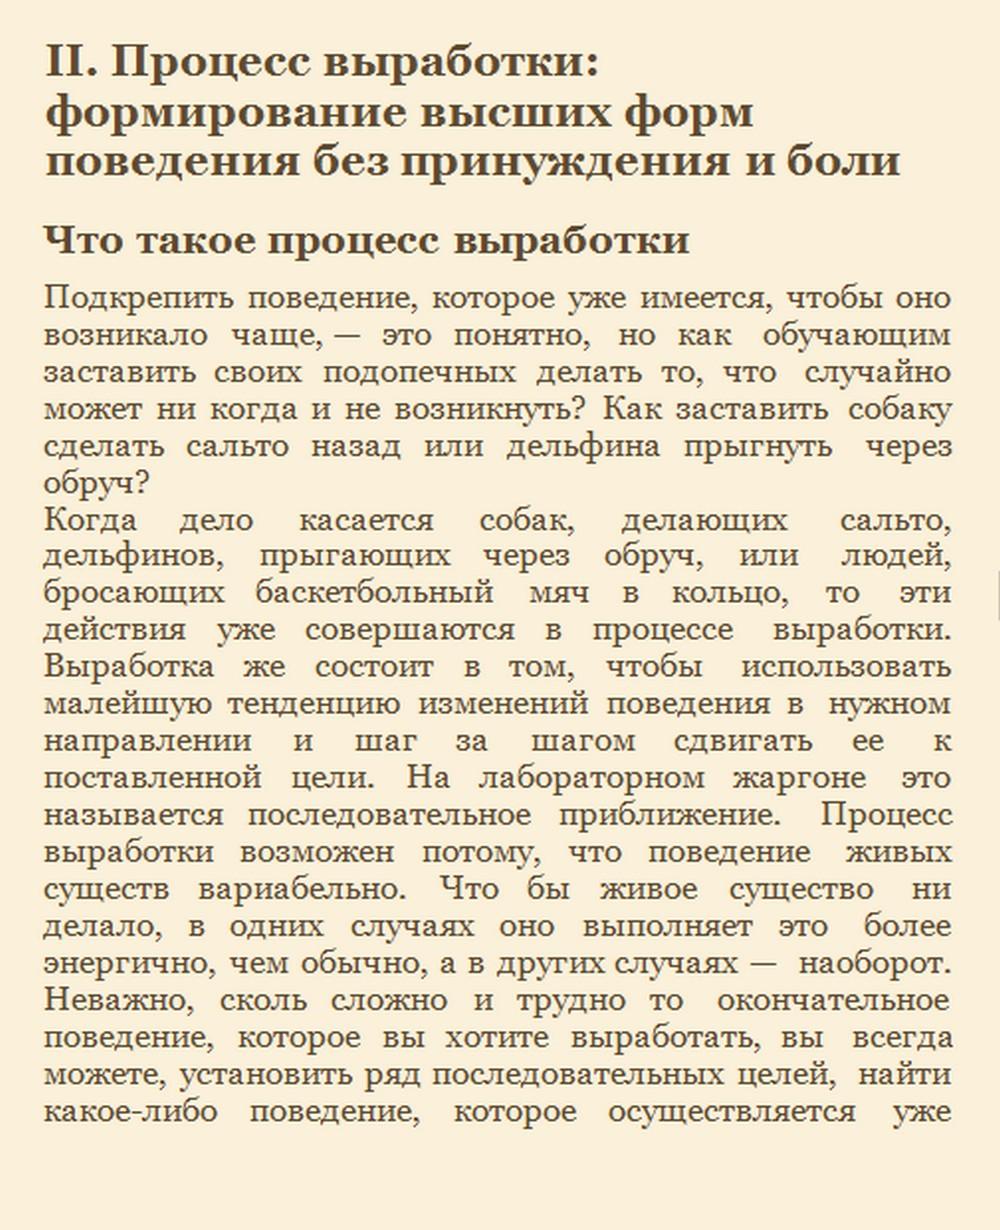 http://i6.imageban.ru/out/2014/01/08/100ba39db4b34d3db153b1e651cdcb1f.jpg